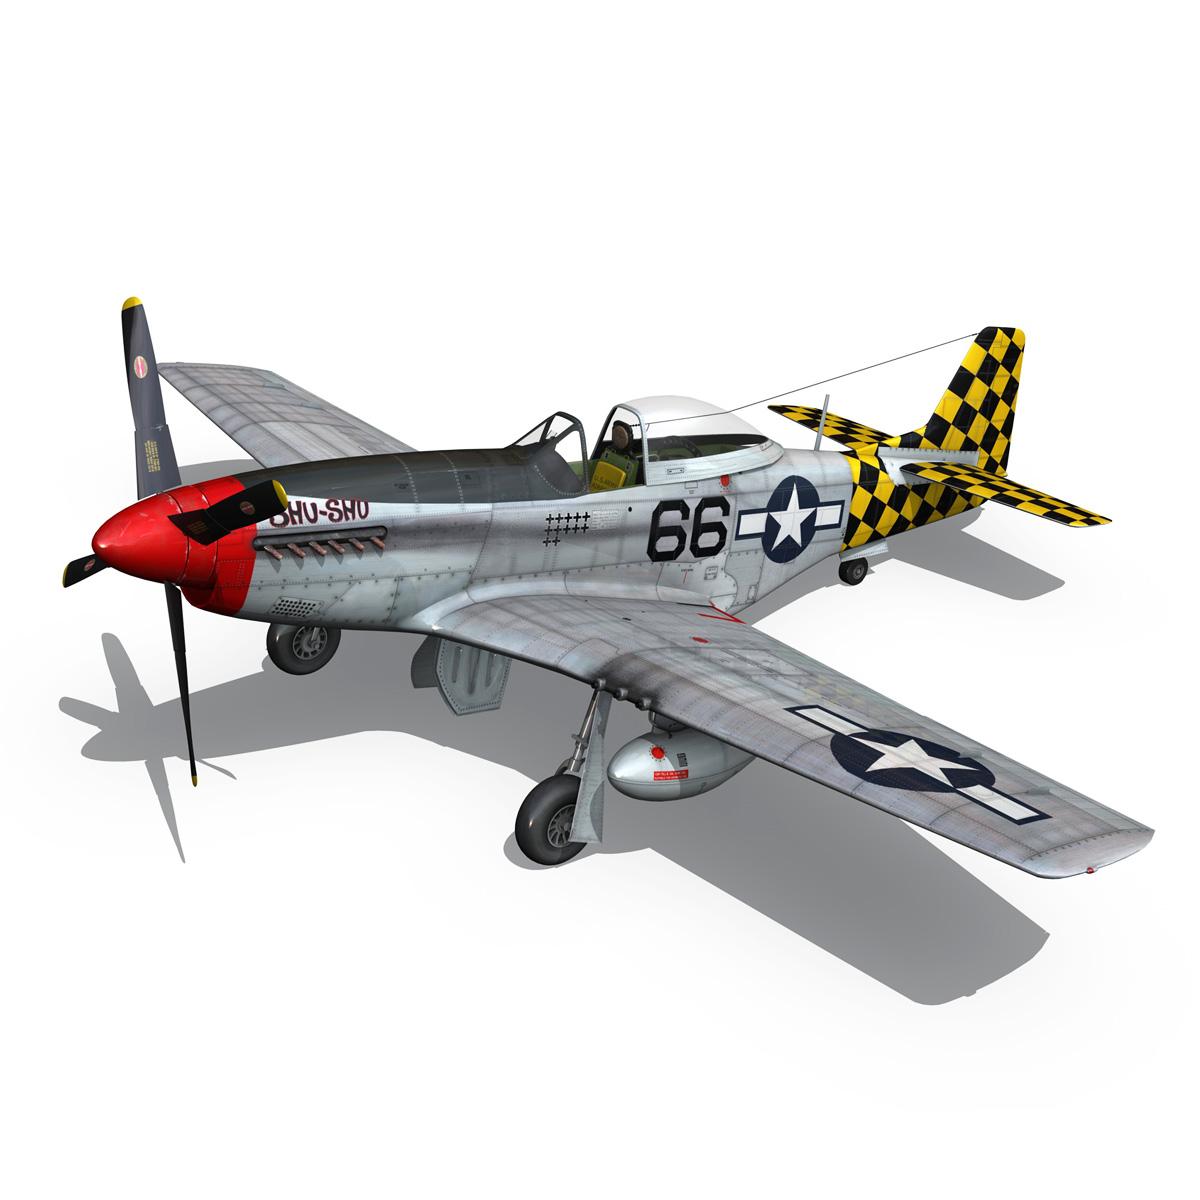 north american p-51d mustang – shu shu 3d model fbx lwo lw lws obj c4d 266245